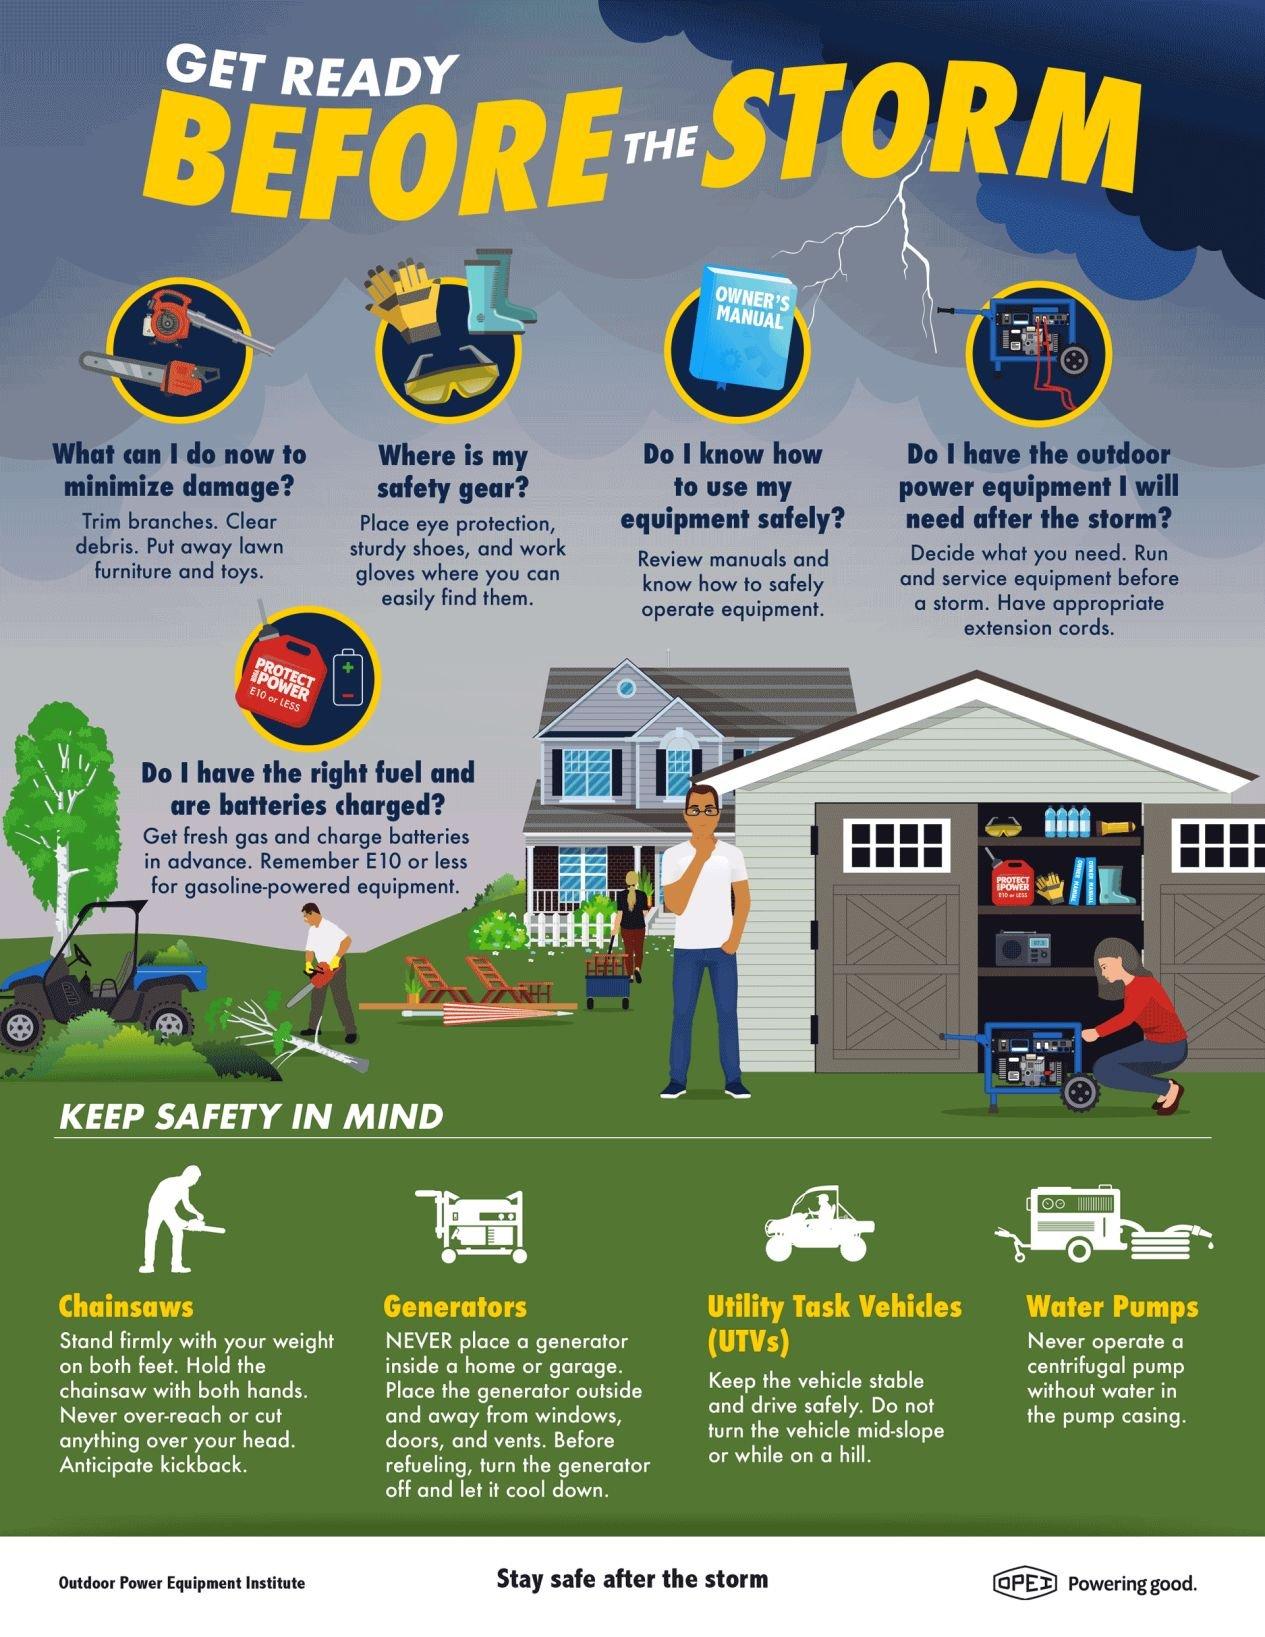 STORM PREPAREDNESS: Be Ready Before a Storm Strikes